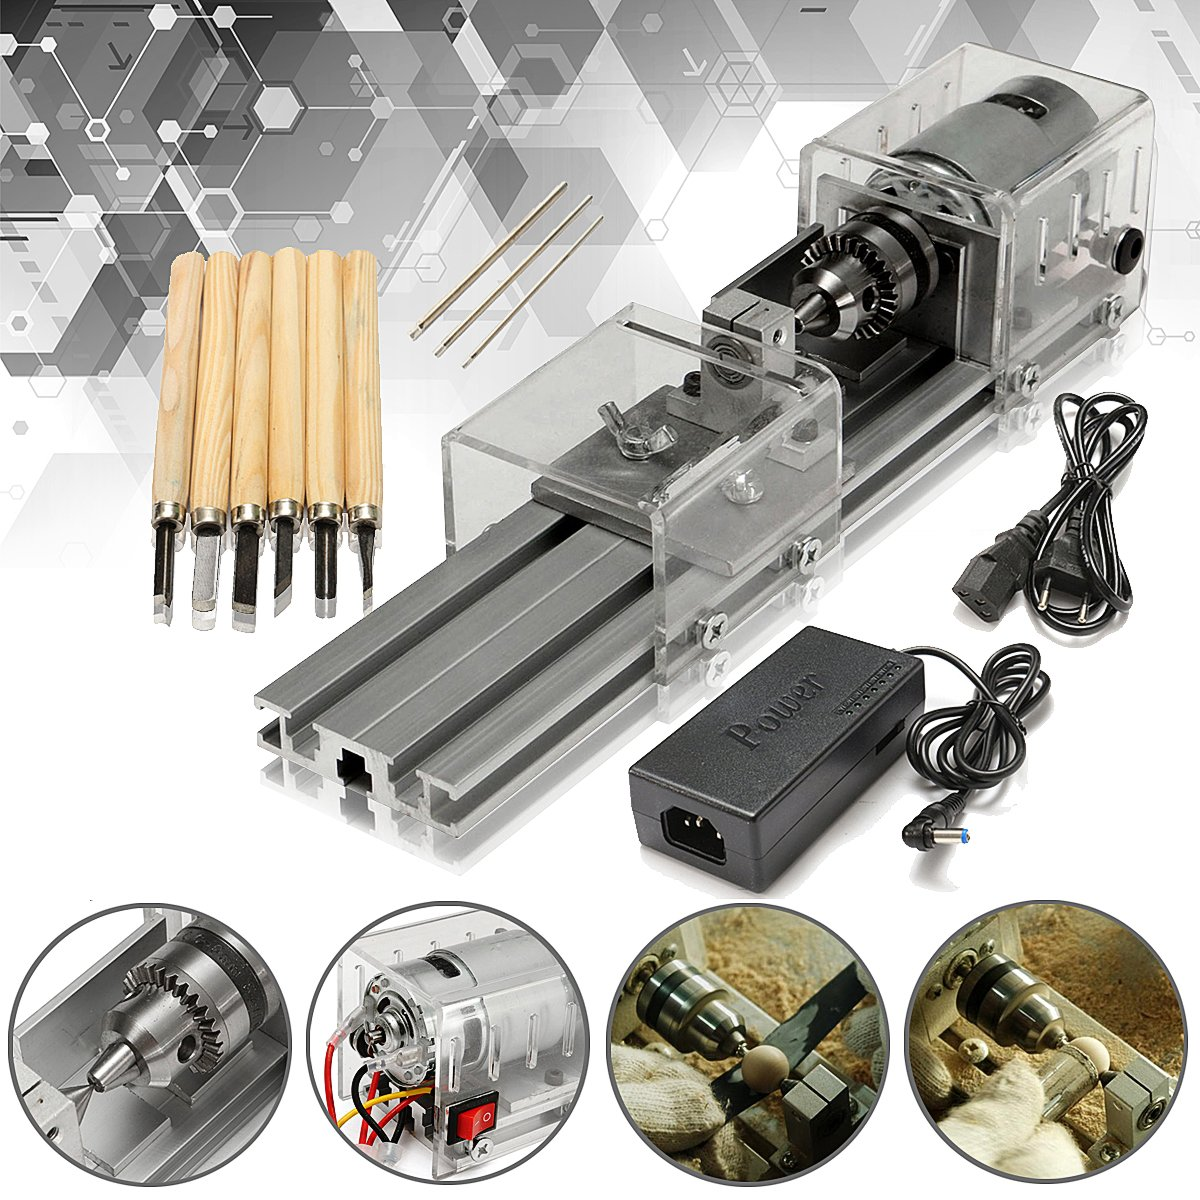 LB-01 Mini Lathe Beads Machine Woodworking DIY Lathe Polishing Drill Rotary Tool DC 24V by SPK603